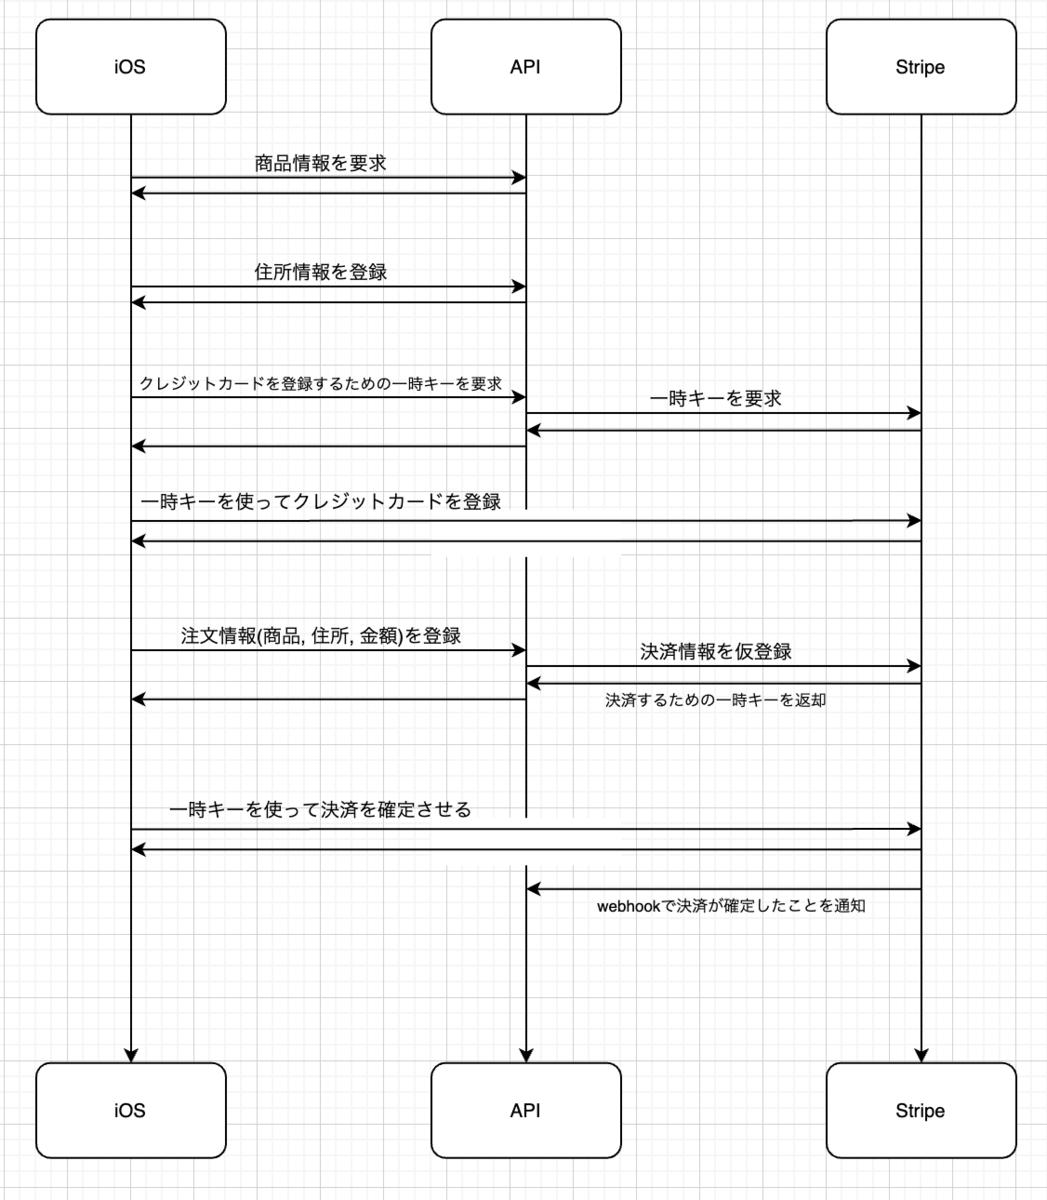 f:id:MH4GF:20201011161021p:plain